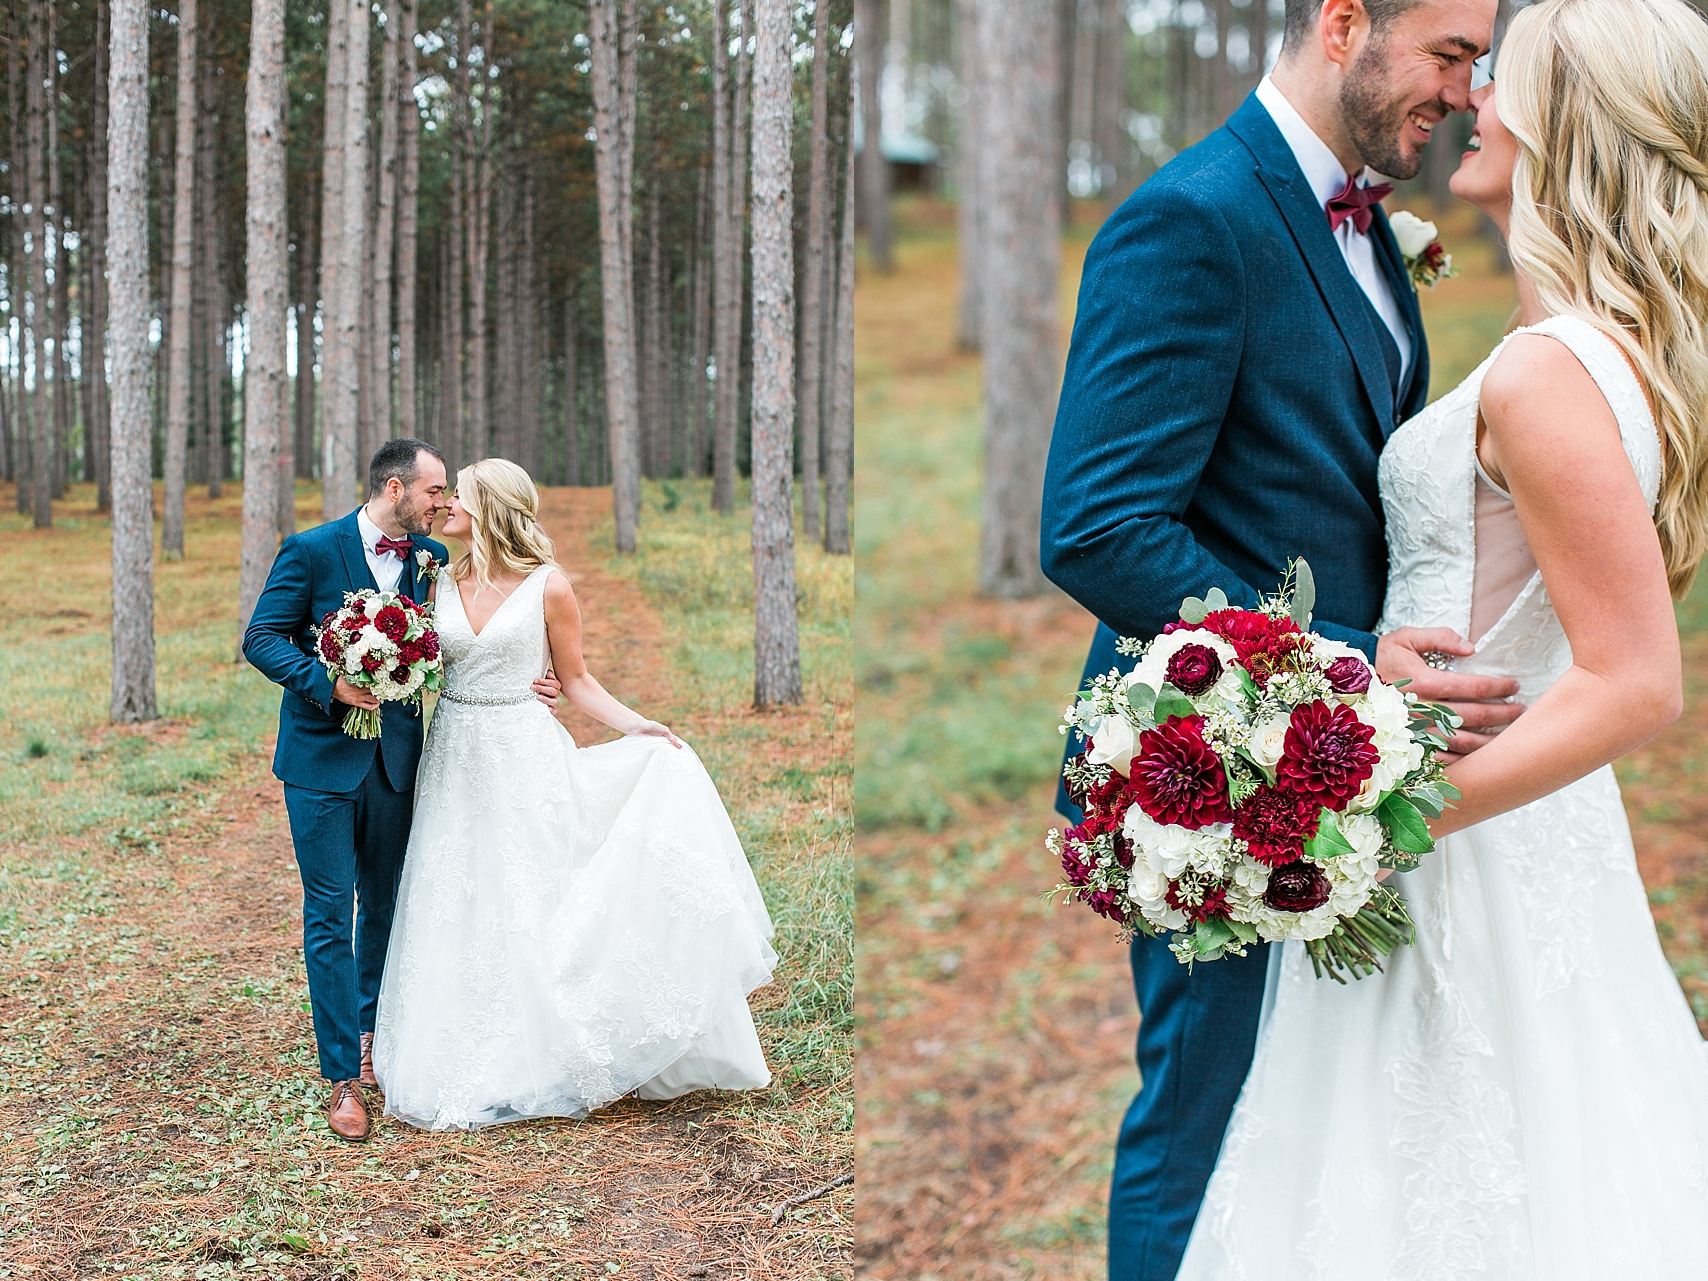 Minnesota Minneapolis Wedding Photographer Best Of 2018 Weddings Mallory Kiesow Photography_0171.jpg